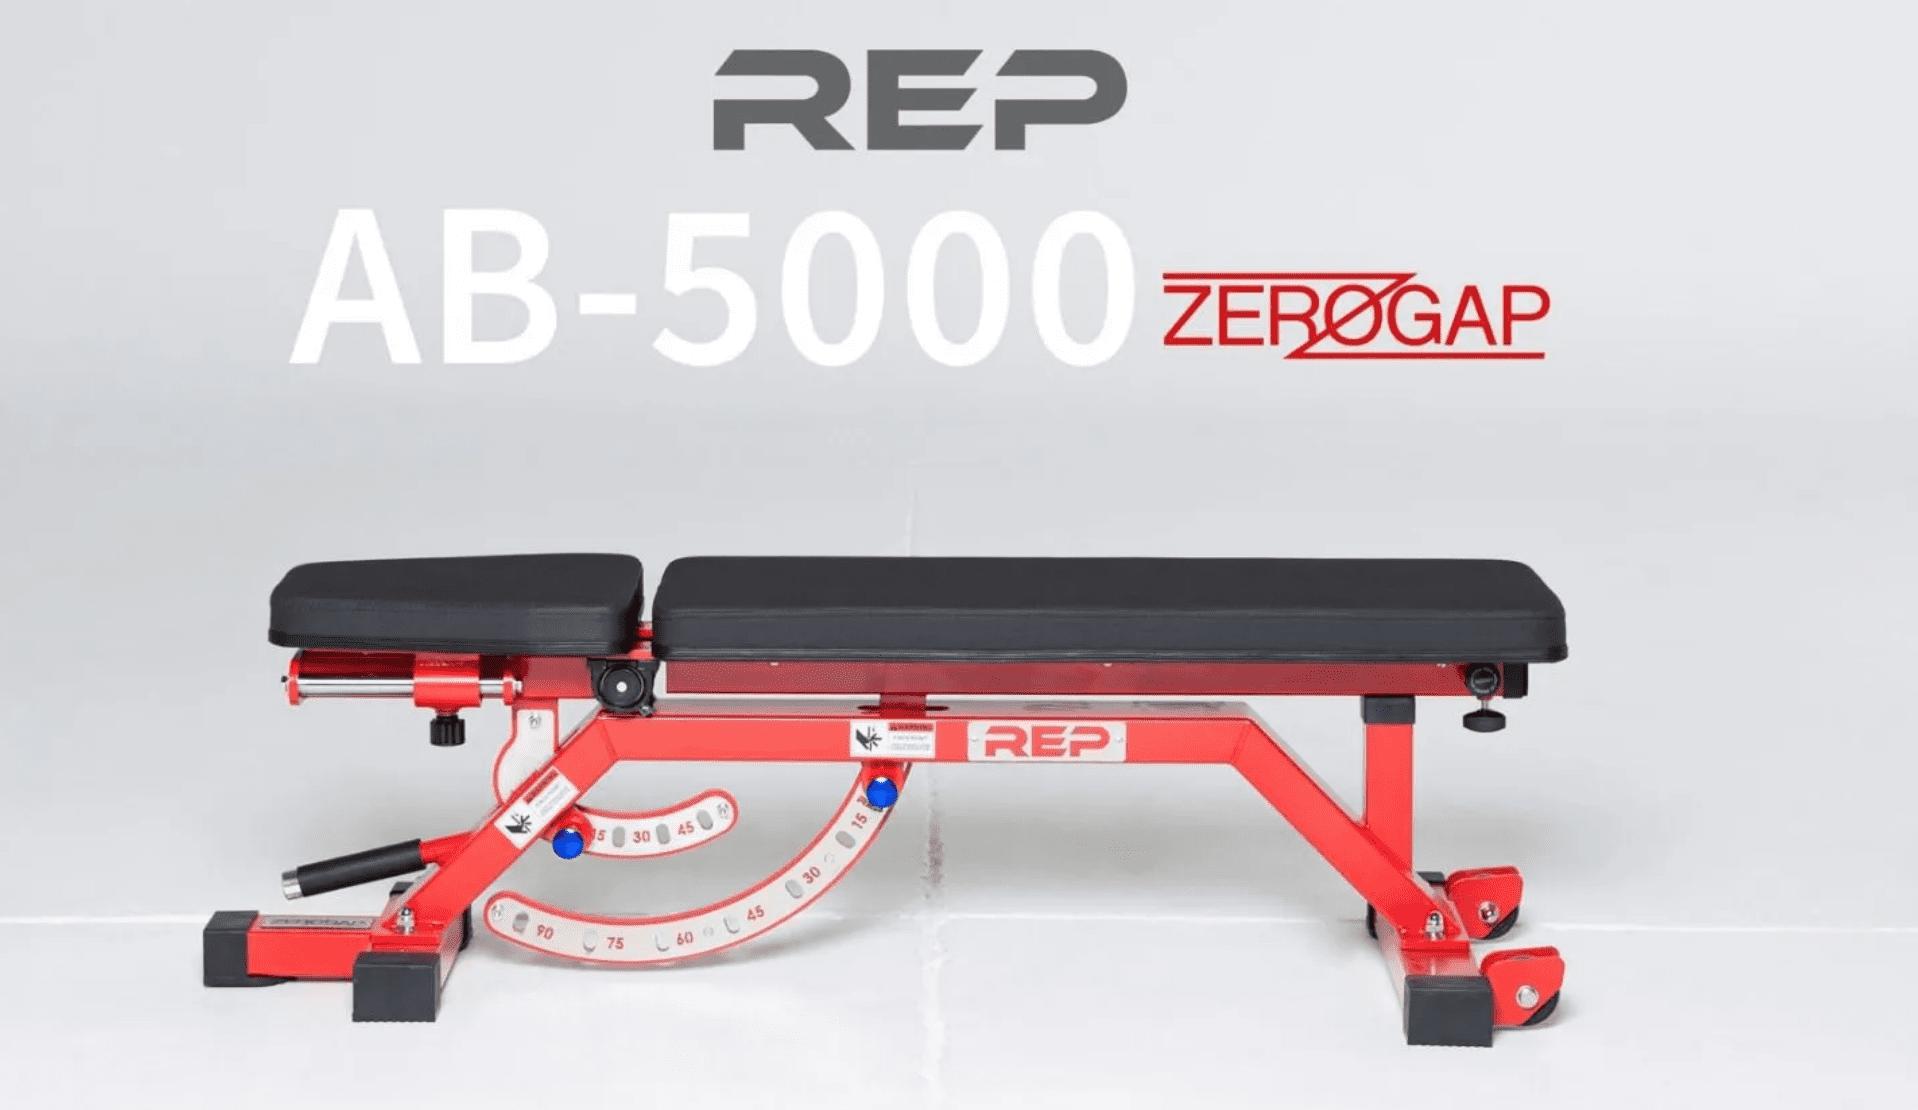 AB-5000 ZERO GAP Adjustable Bench